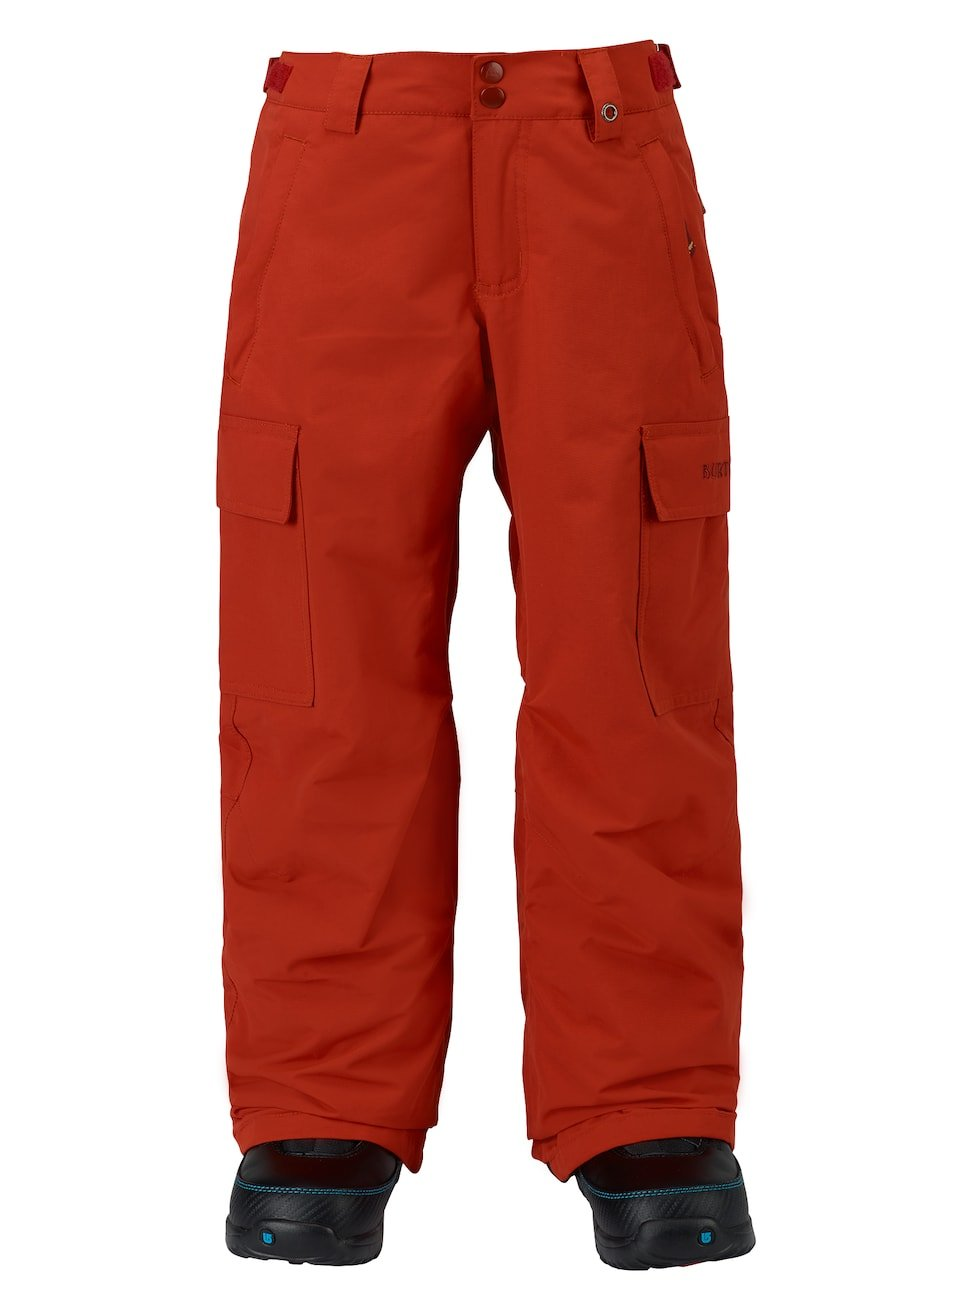 Burton Boys Exile Cargo Pants, Bitters, X-Small